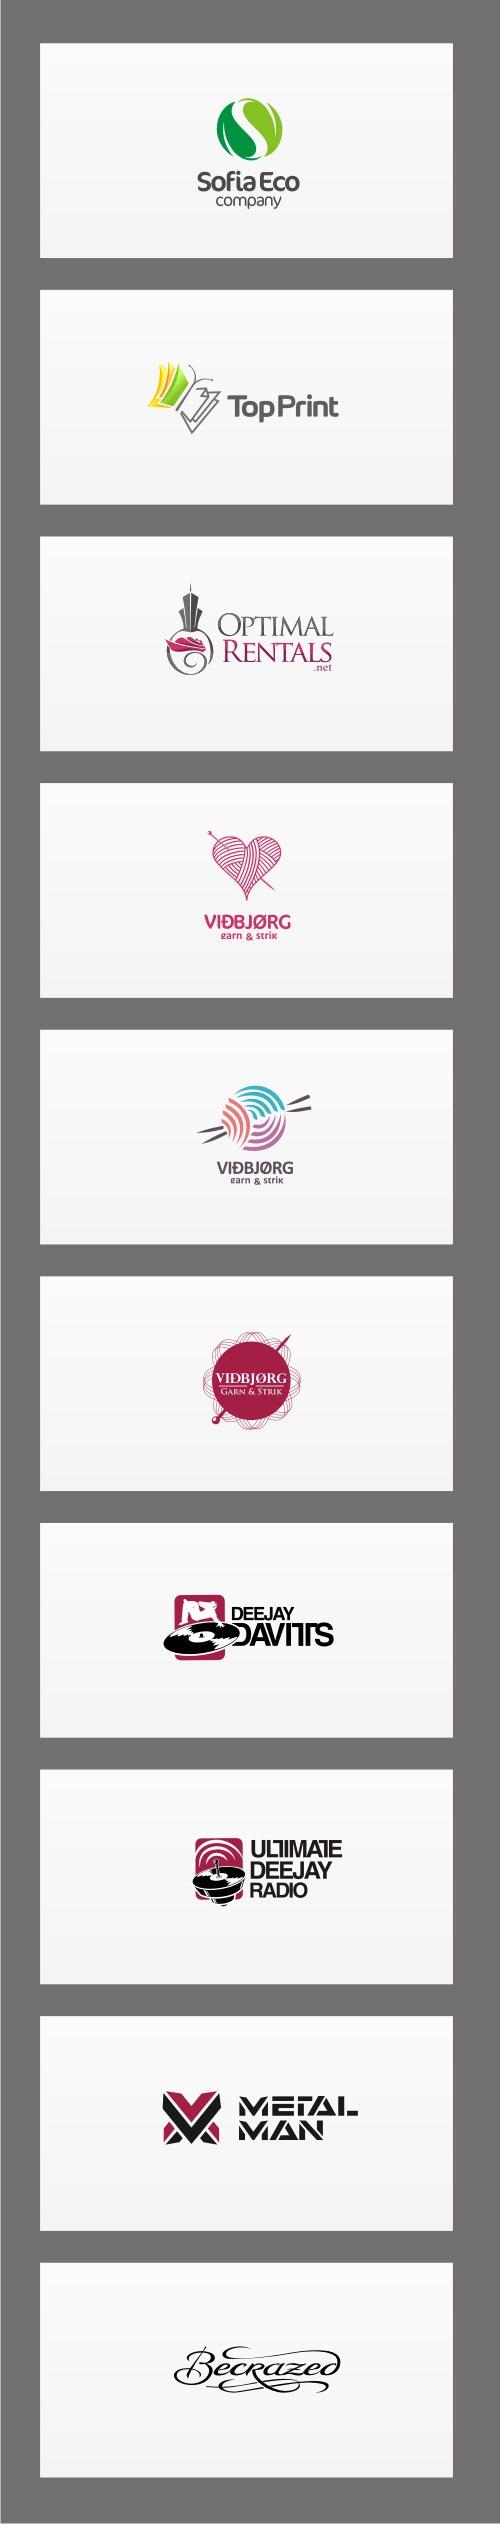 Logos v.2 by Ivan Manolov, via Behance